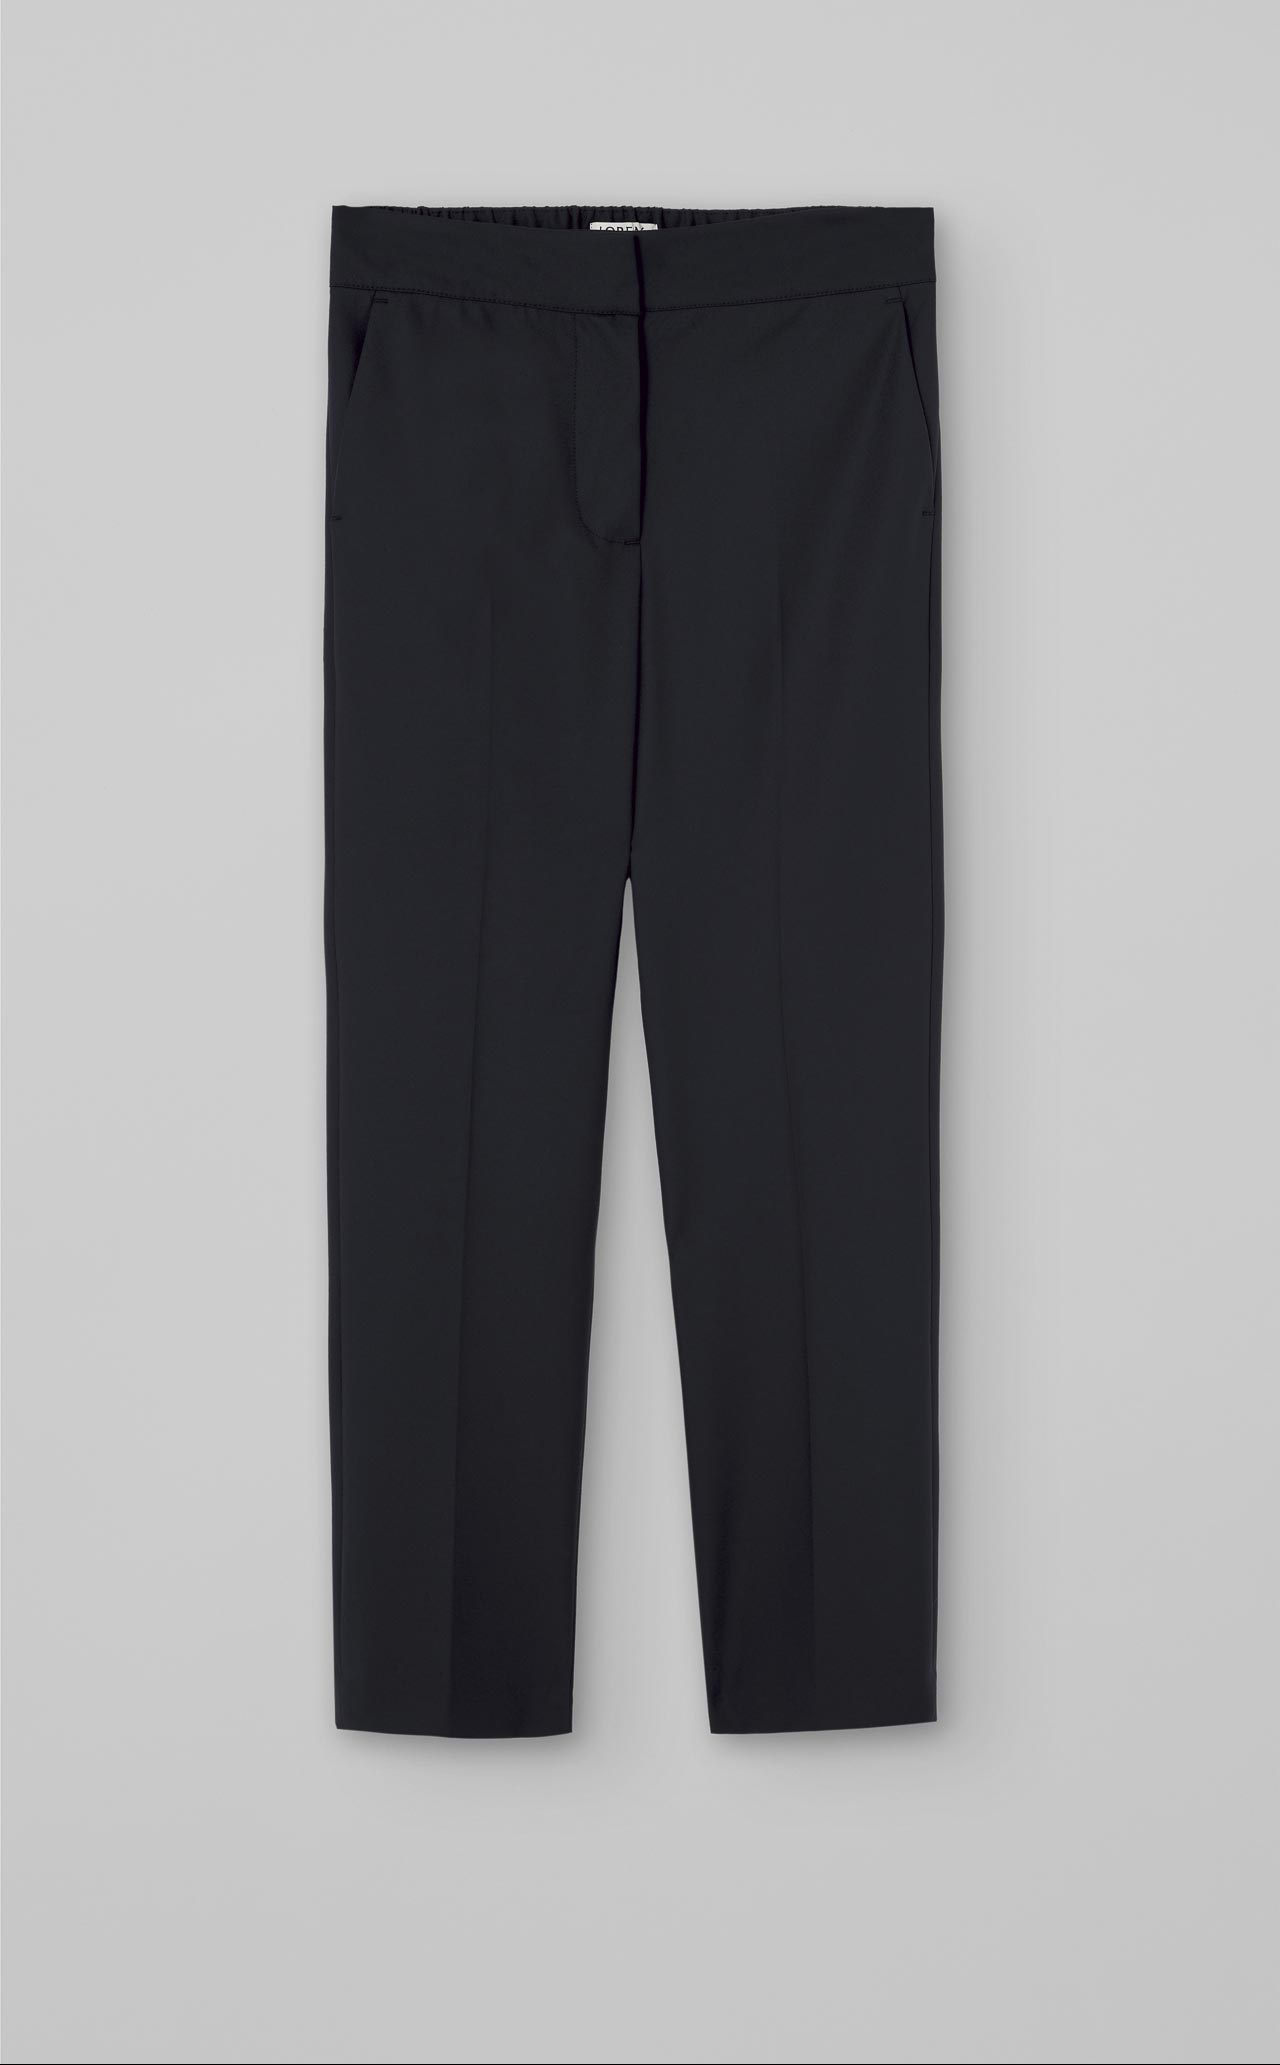 Pantalon Romi